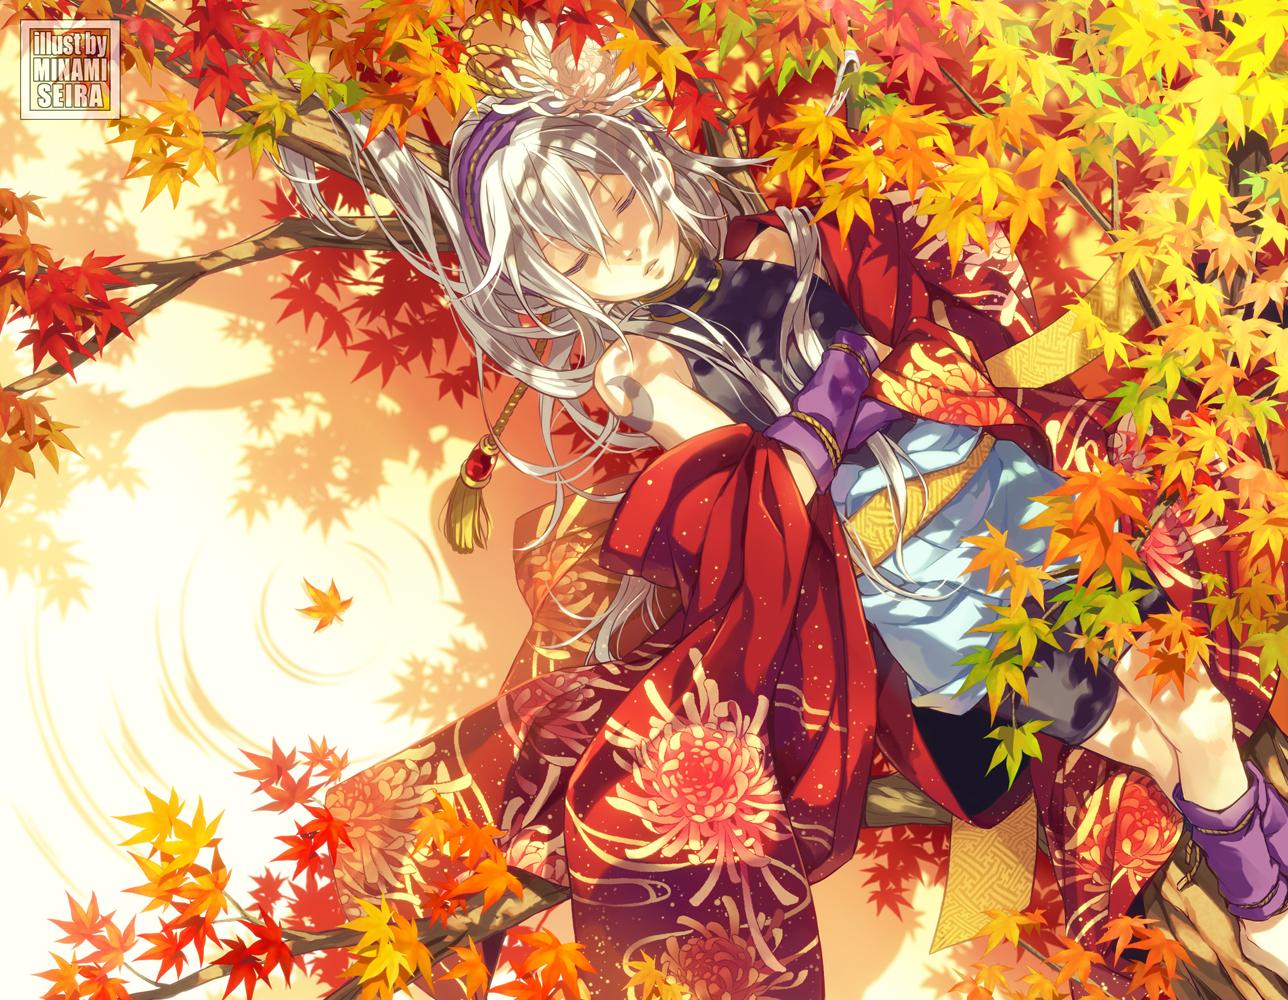 Fairy Tail Manga Minami Seira Image 1313273 Zerochan Anime Image Board